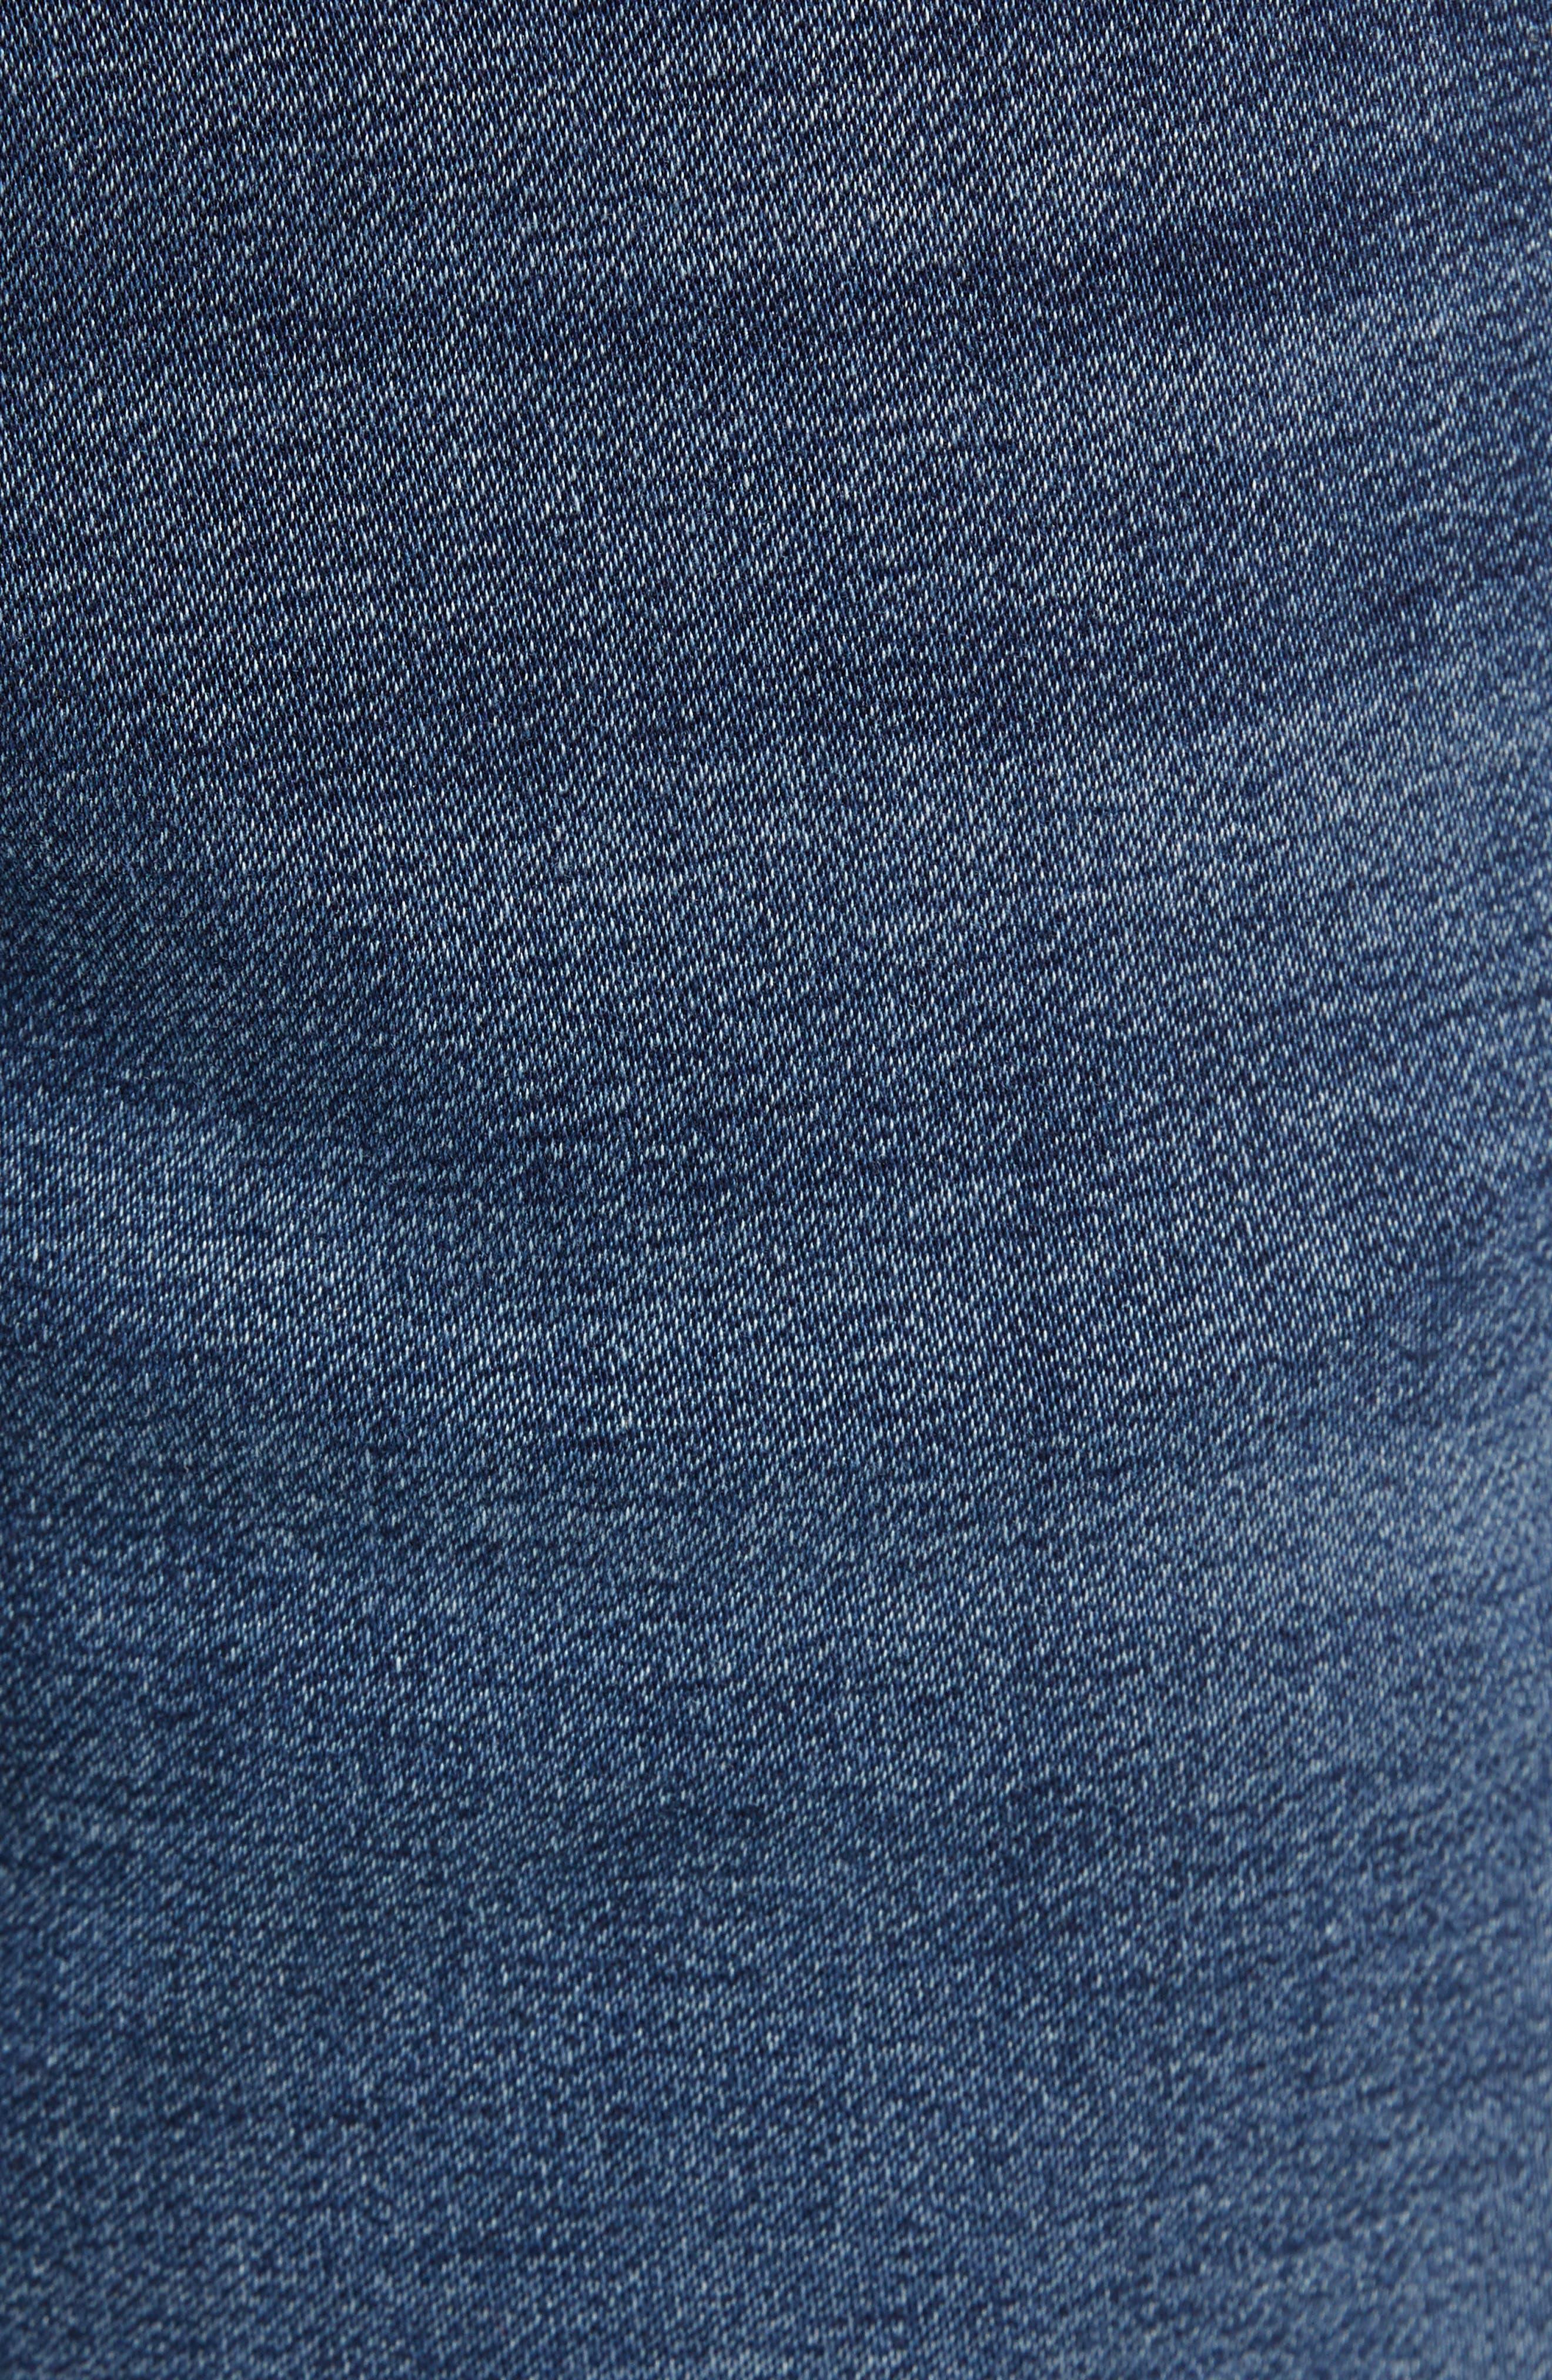 Jake Slim Fit Jeans,                             Alternate thumbnail 5, color,                             DARK SPORTY